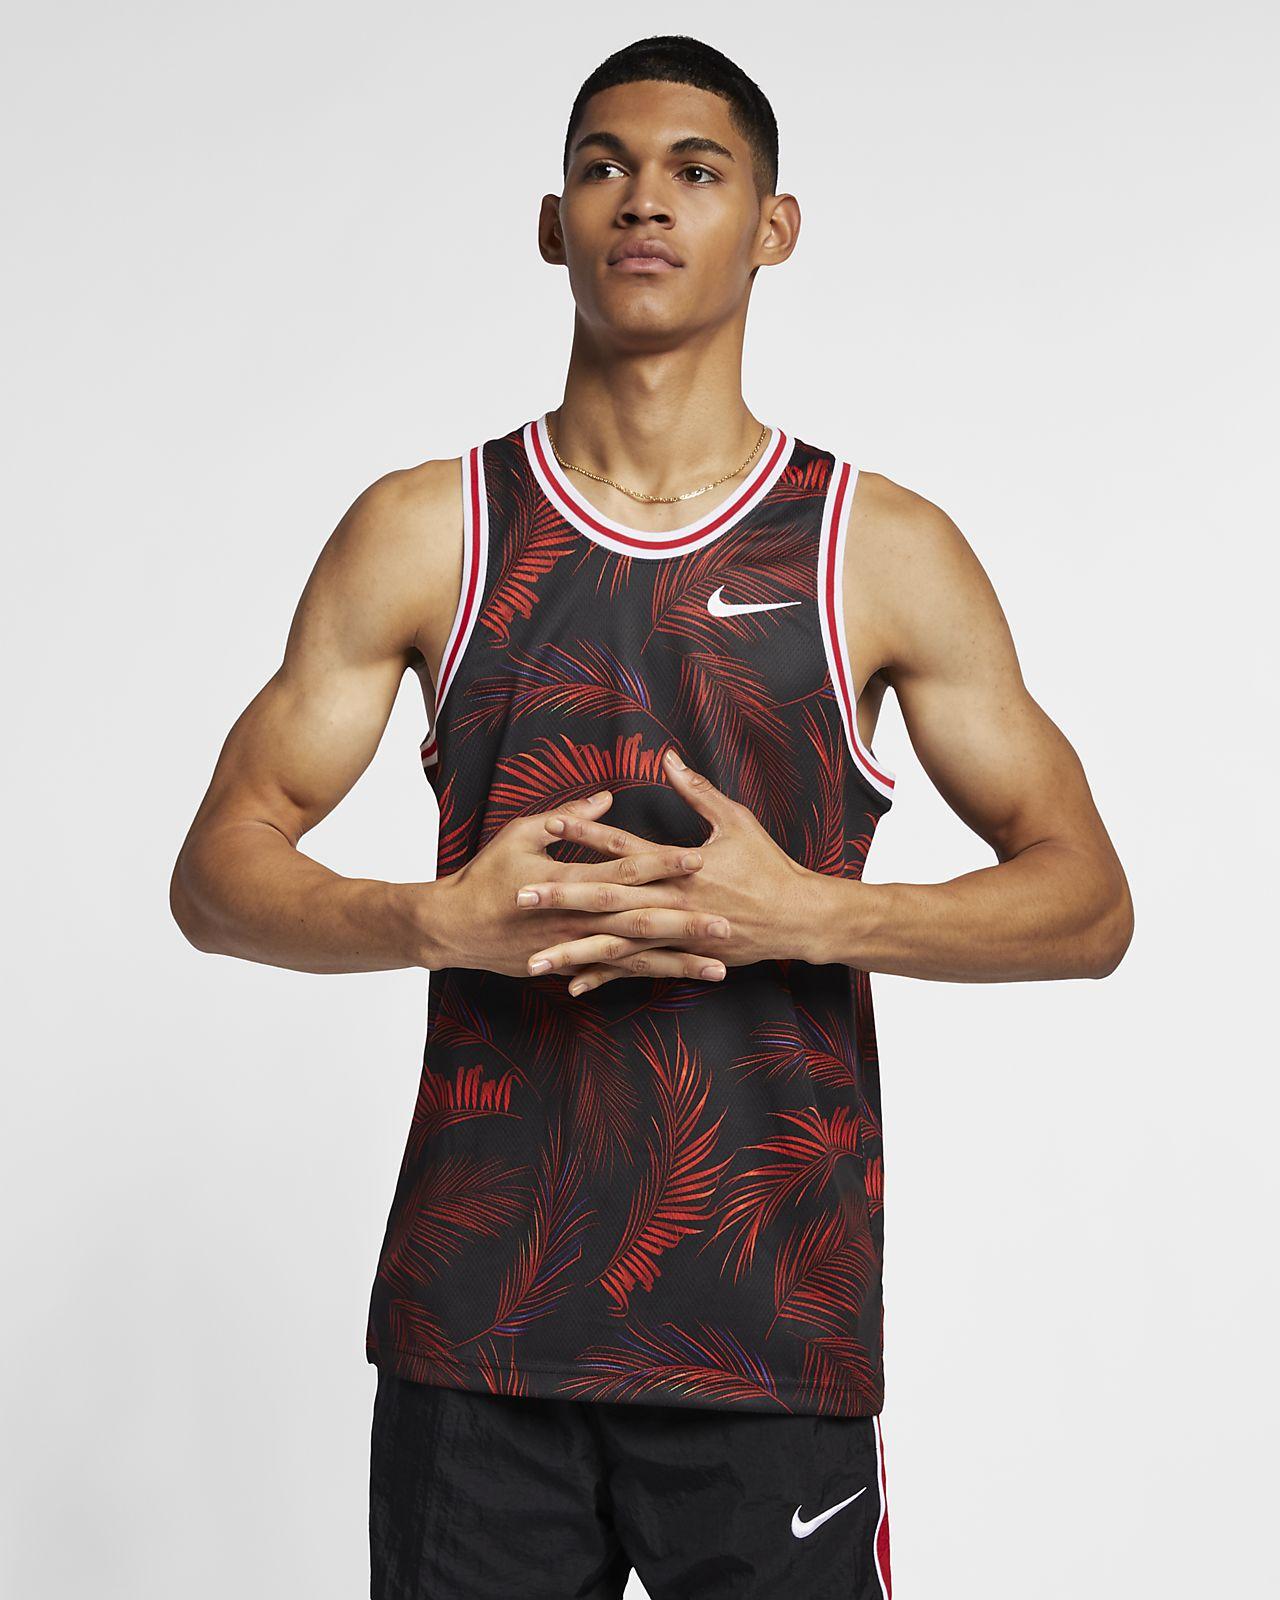 8c60abc9f56c6 Camiseta de básquetbol estampada para hombre Nike Dri-FIT DNA. Nike ...